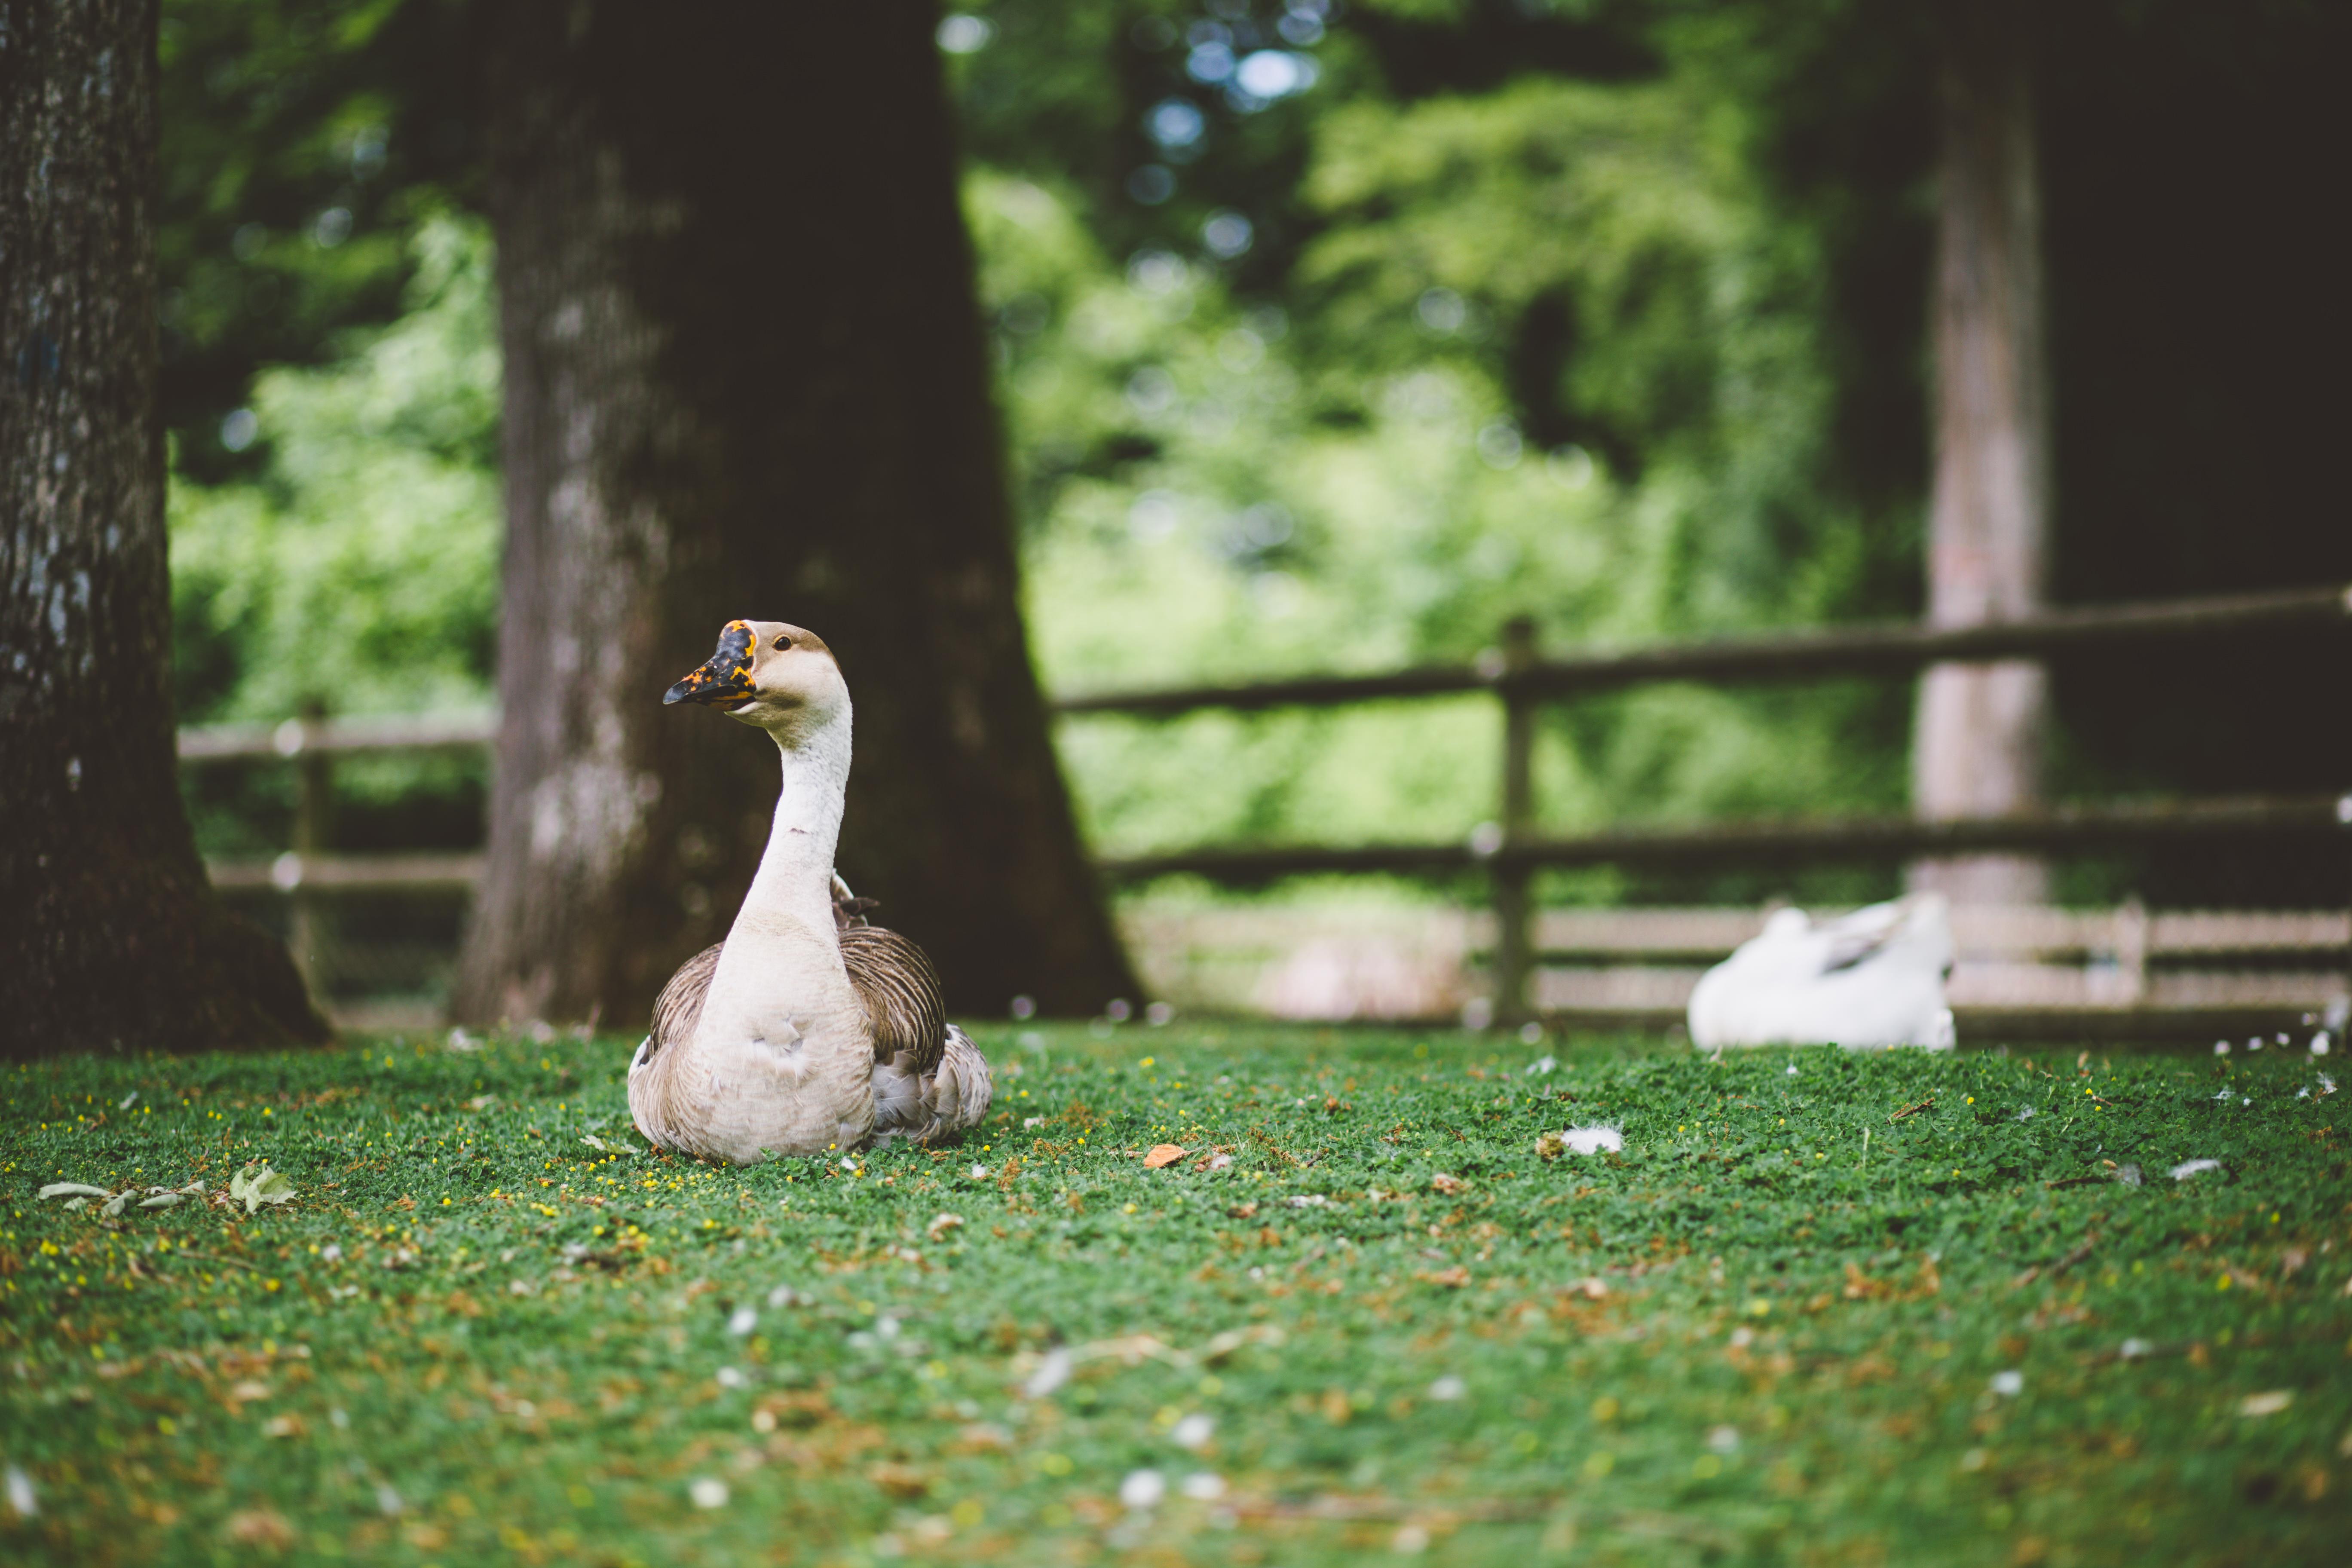 Sitting Duck, Bird, Duck, Park, Plants, HQ Photo